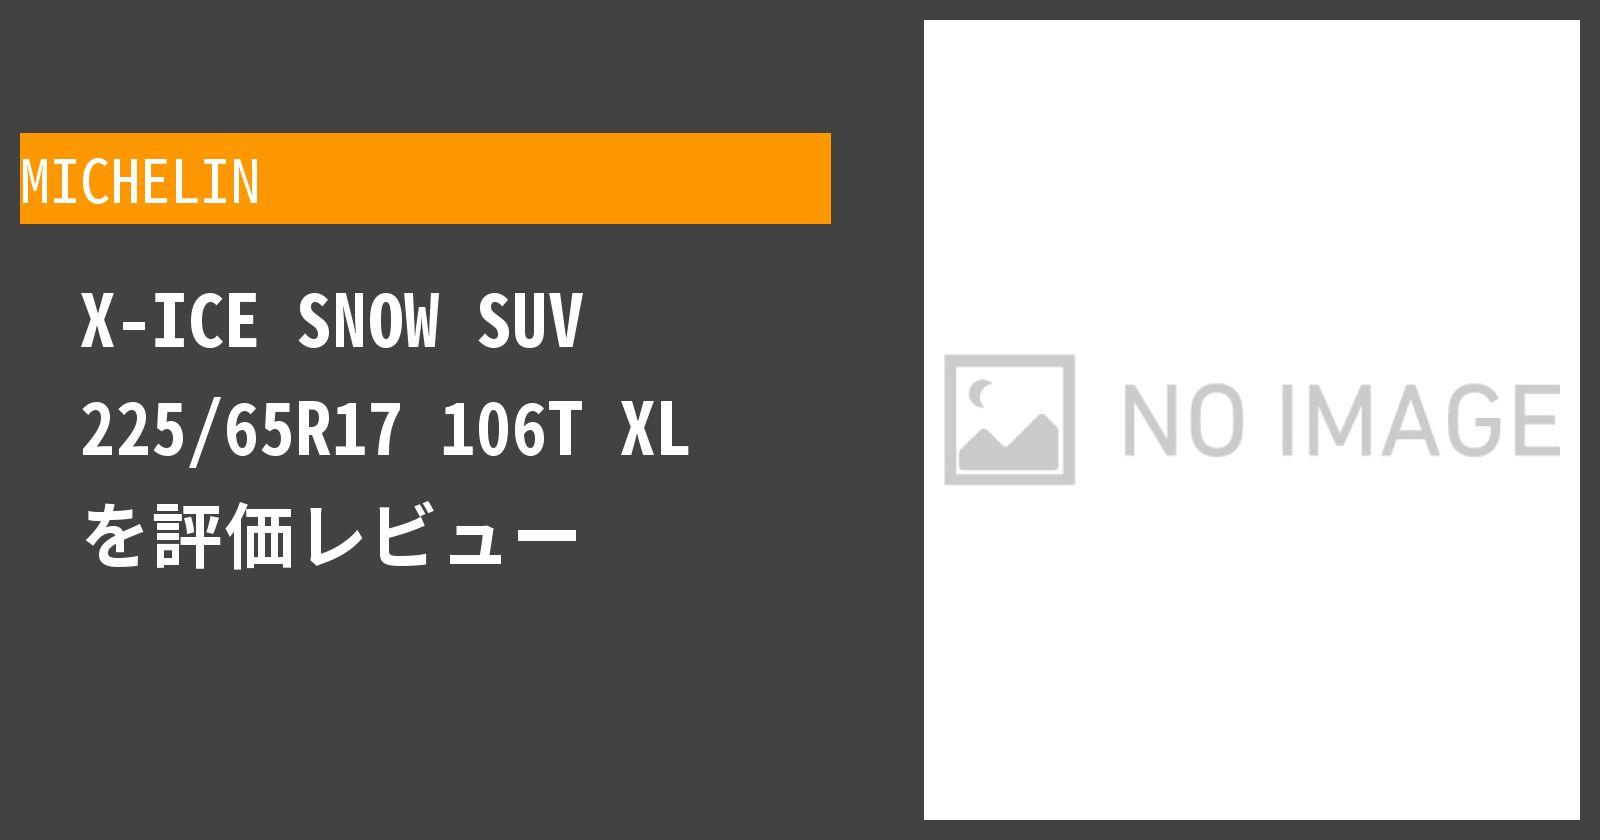 X-ICE SNOW SUV 225/65R17 106T XLを徹底評価